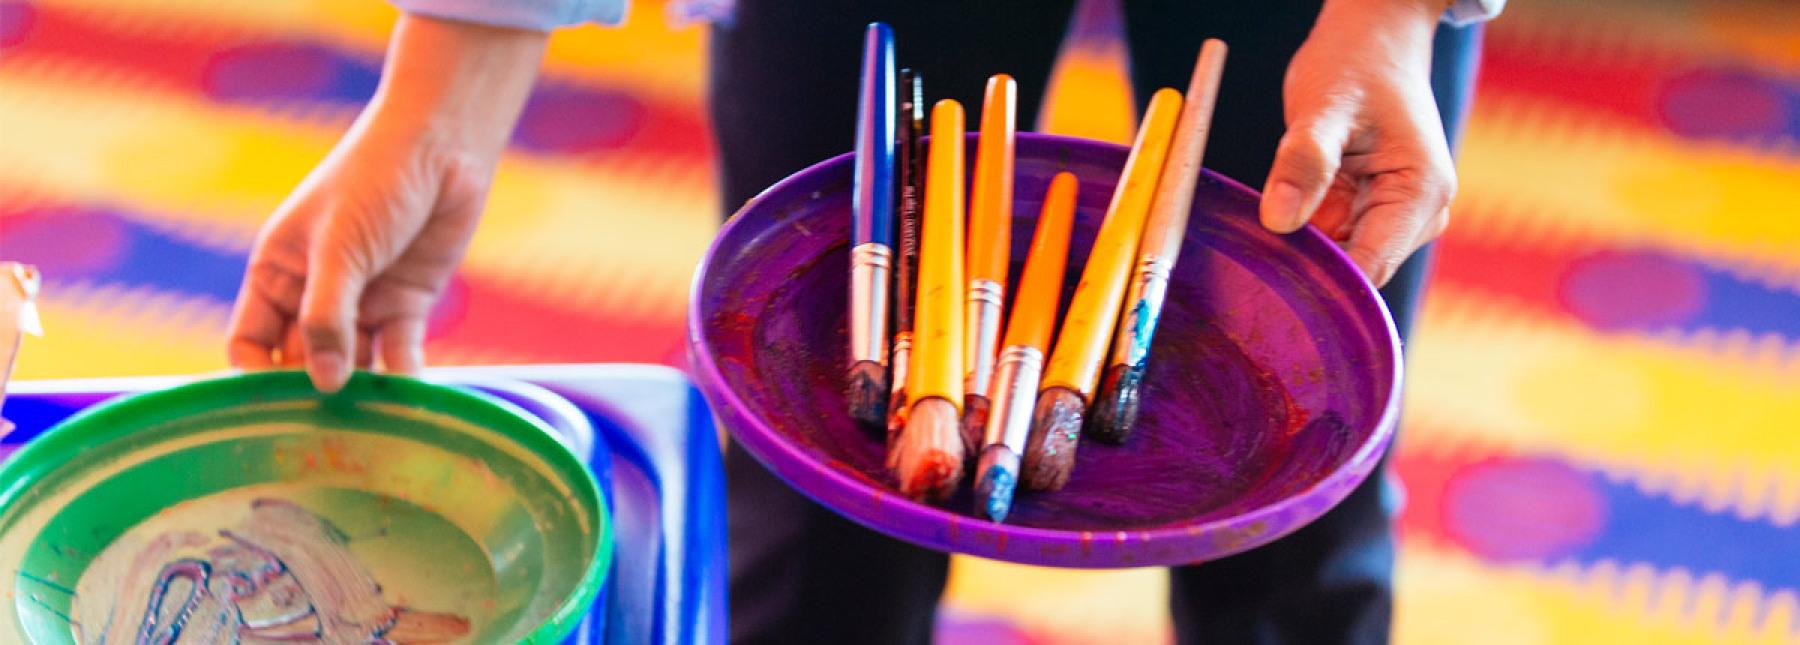 Carnival Valor arts-and-crafts-1.jpg